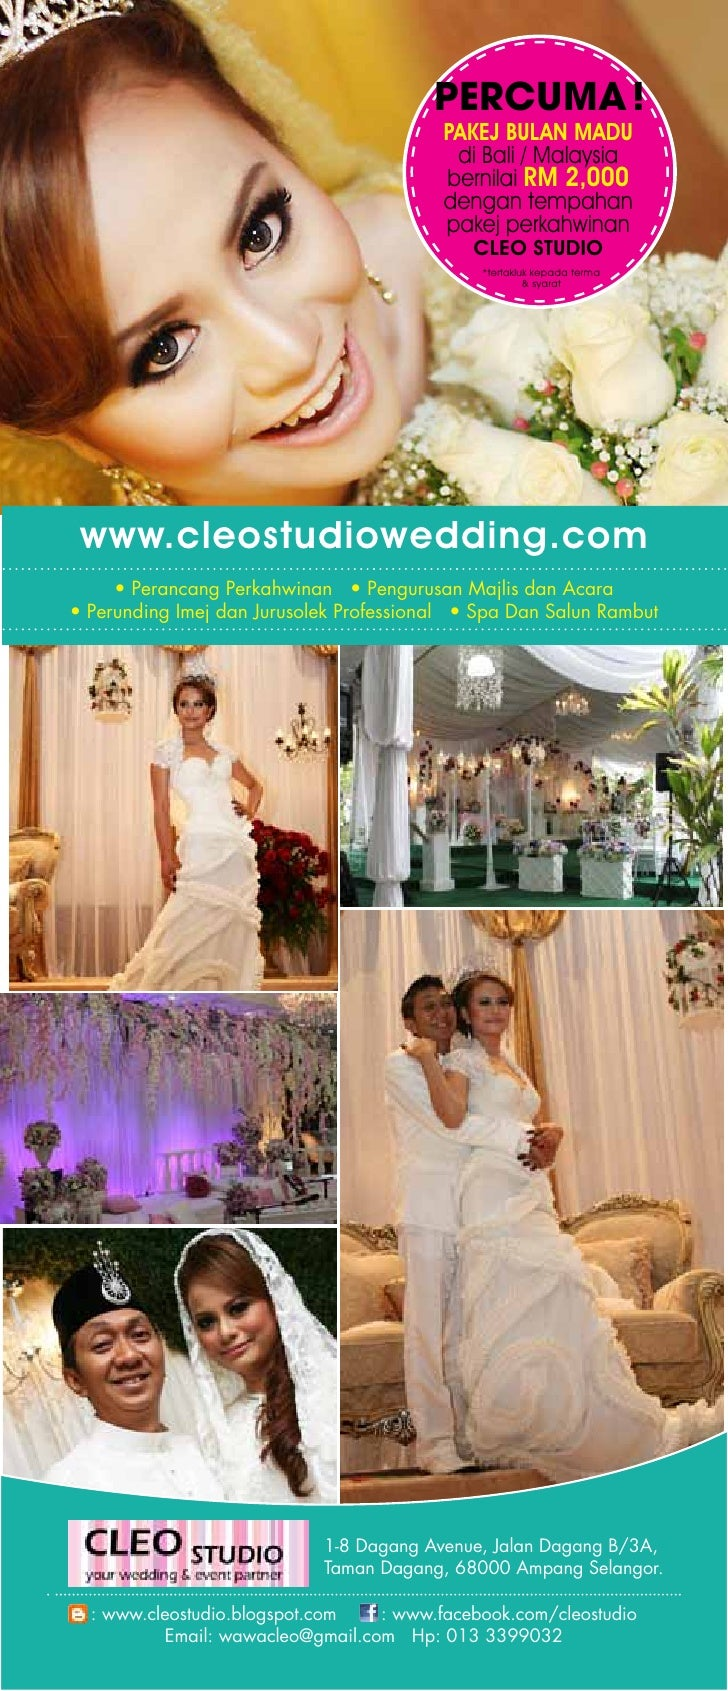 Cleo Studio Wedding Package Promotion